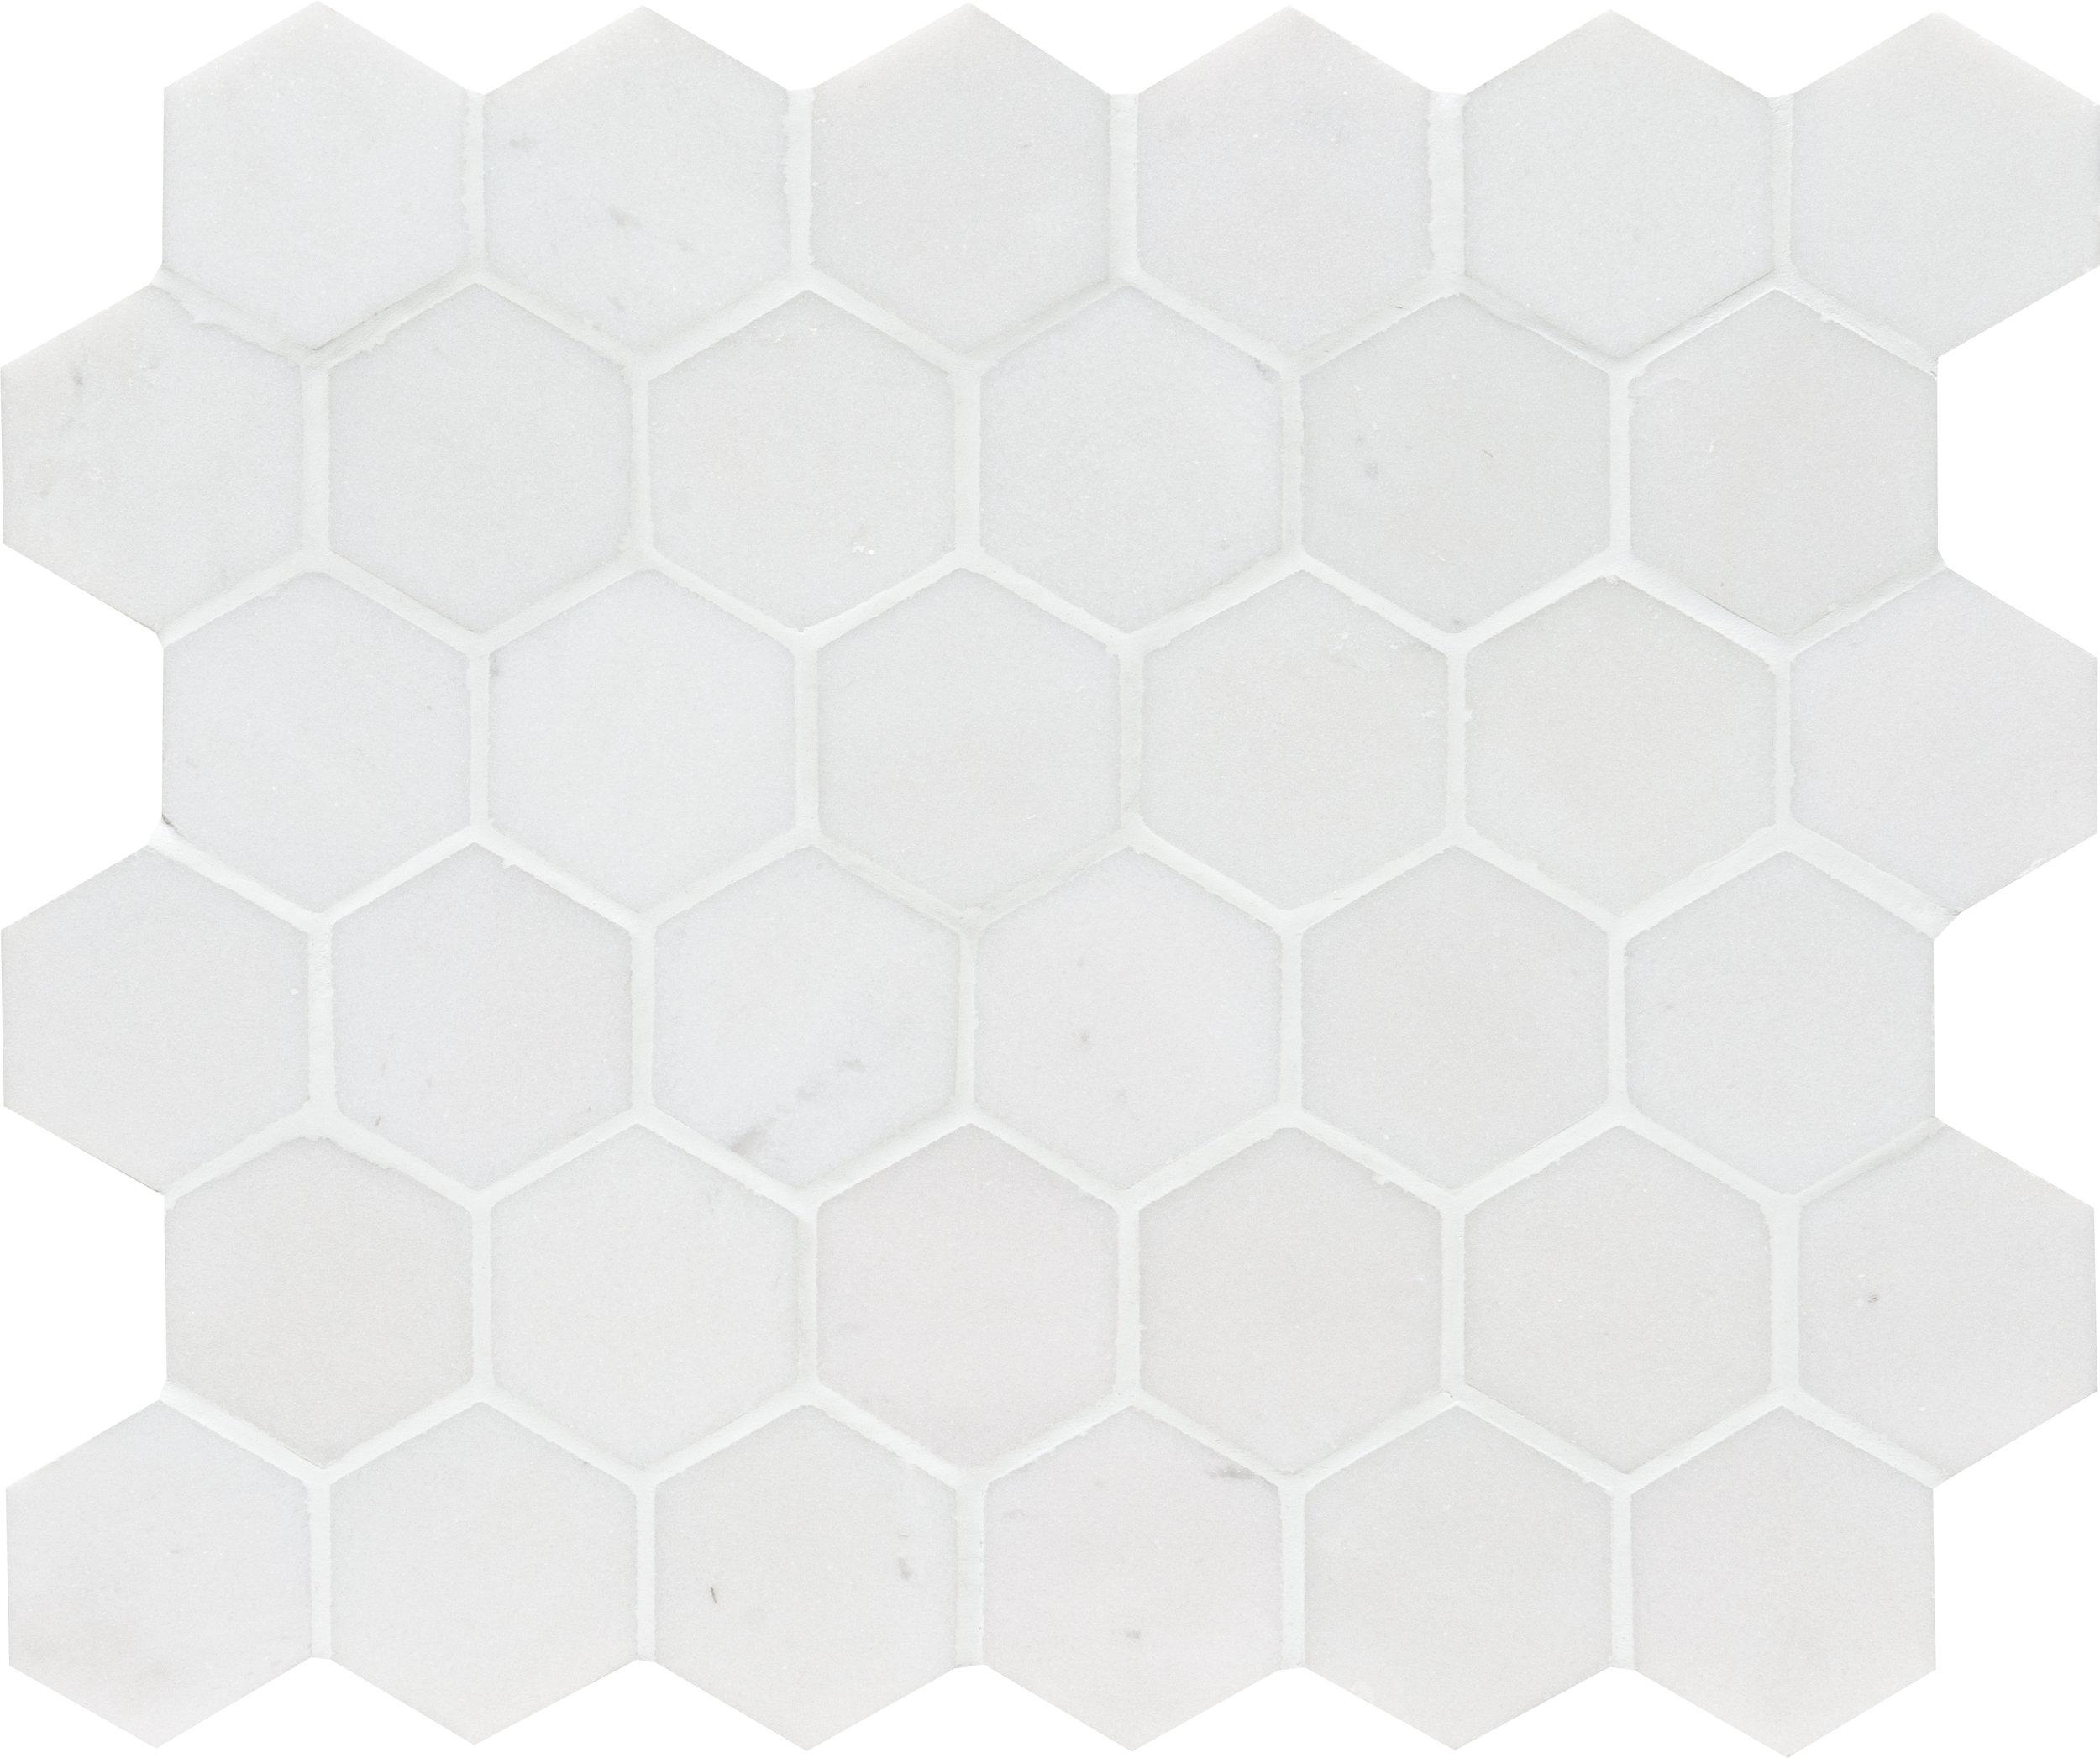 "MS01336 aspen white honed hexagon 2"" - 10 3/8""x12x3/8"" sheets"